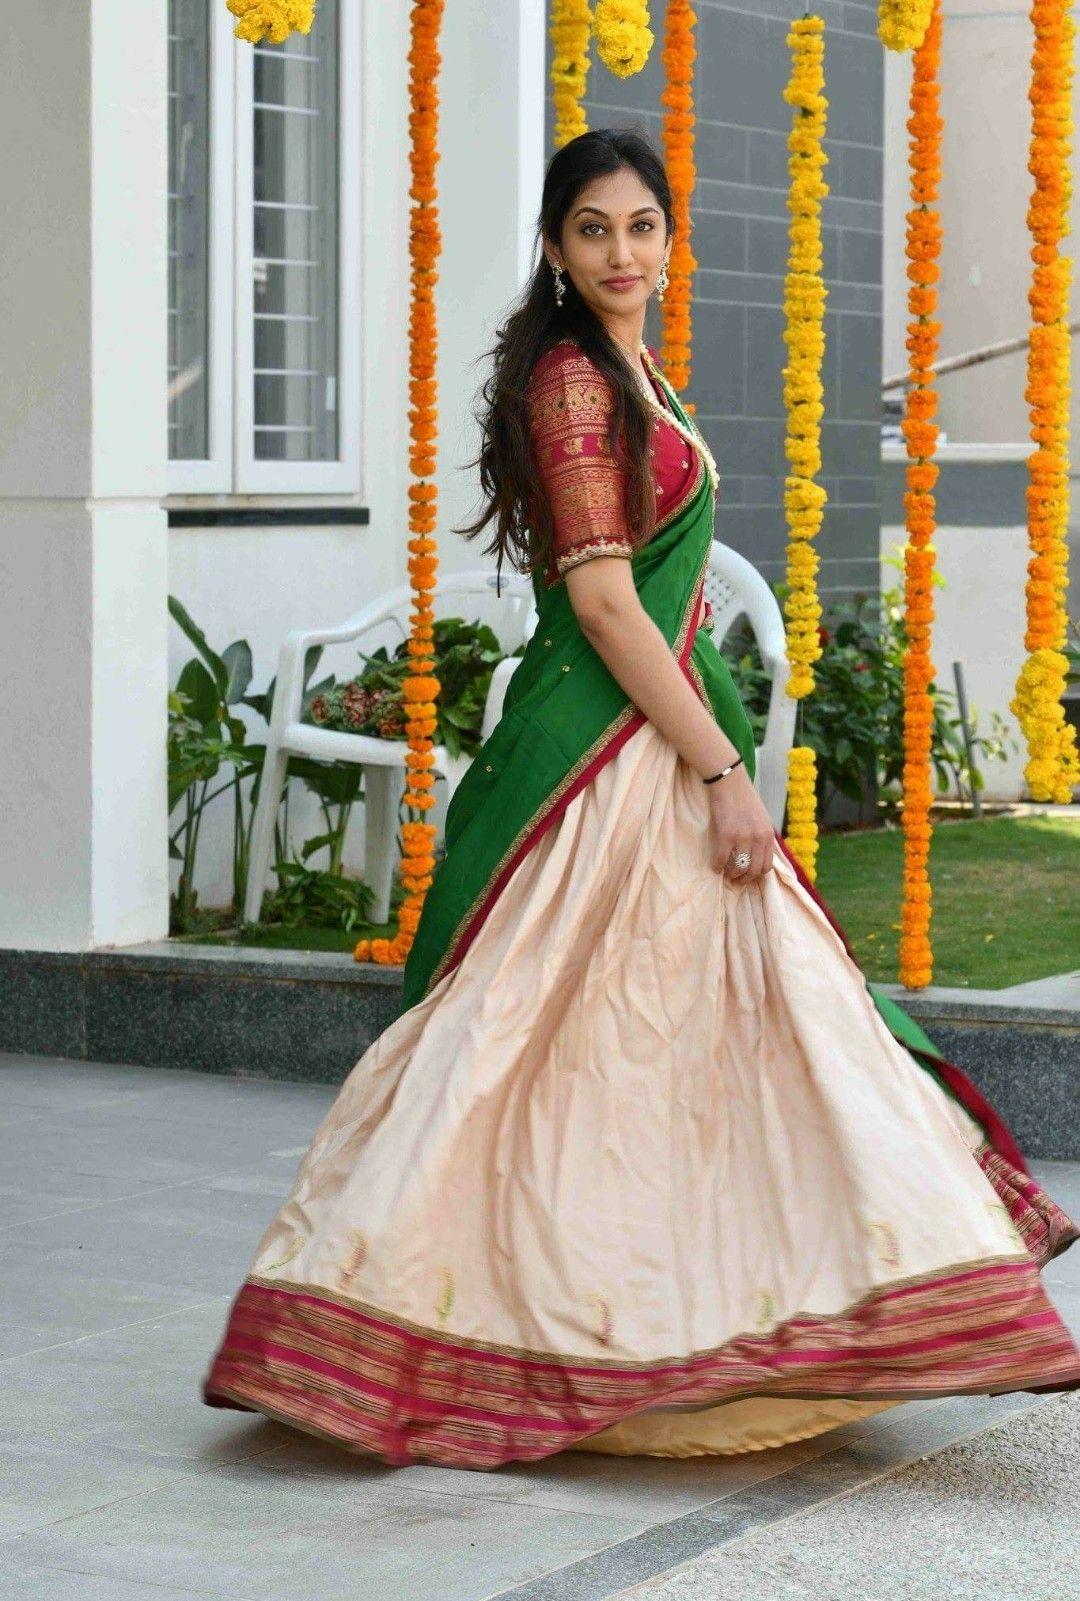 Pin By Anera On Awesome Half Saree Designs Half Saree Lehenga Saree Dress